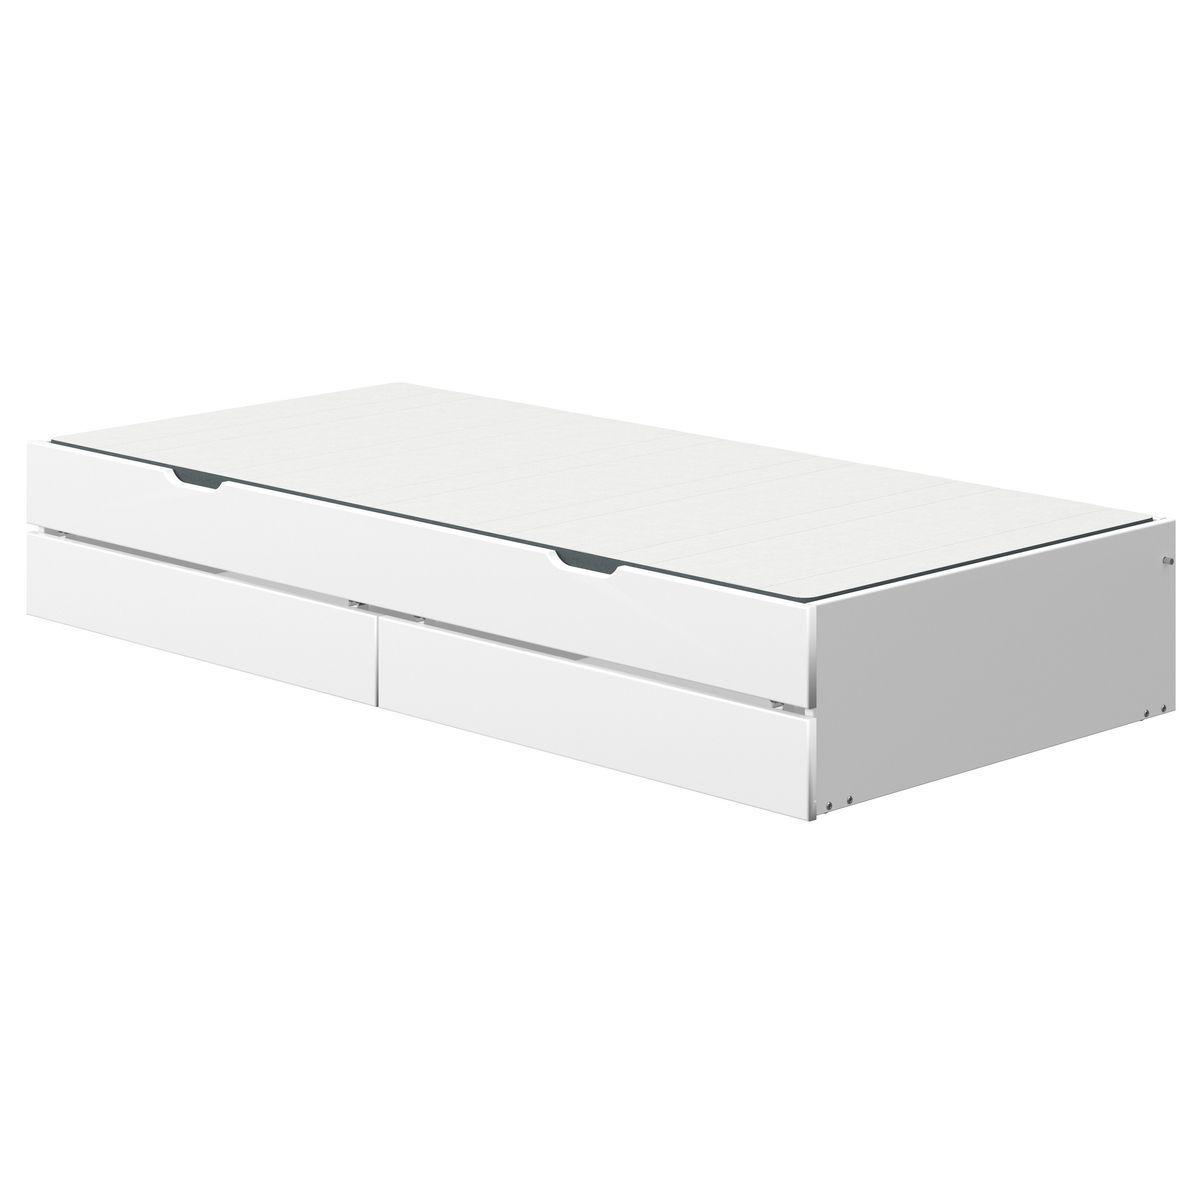 Gästebett-2 Schubladen 190cm NOR Flexa weiß